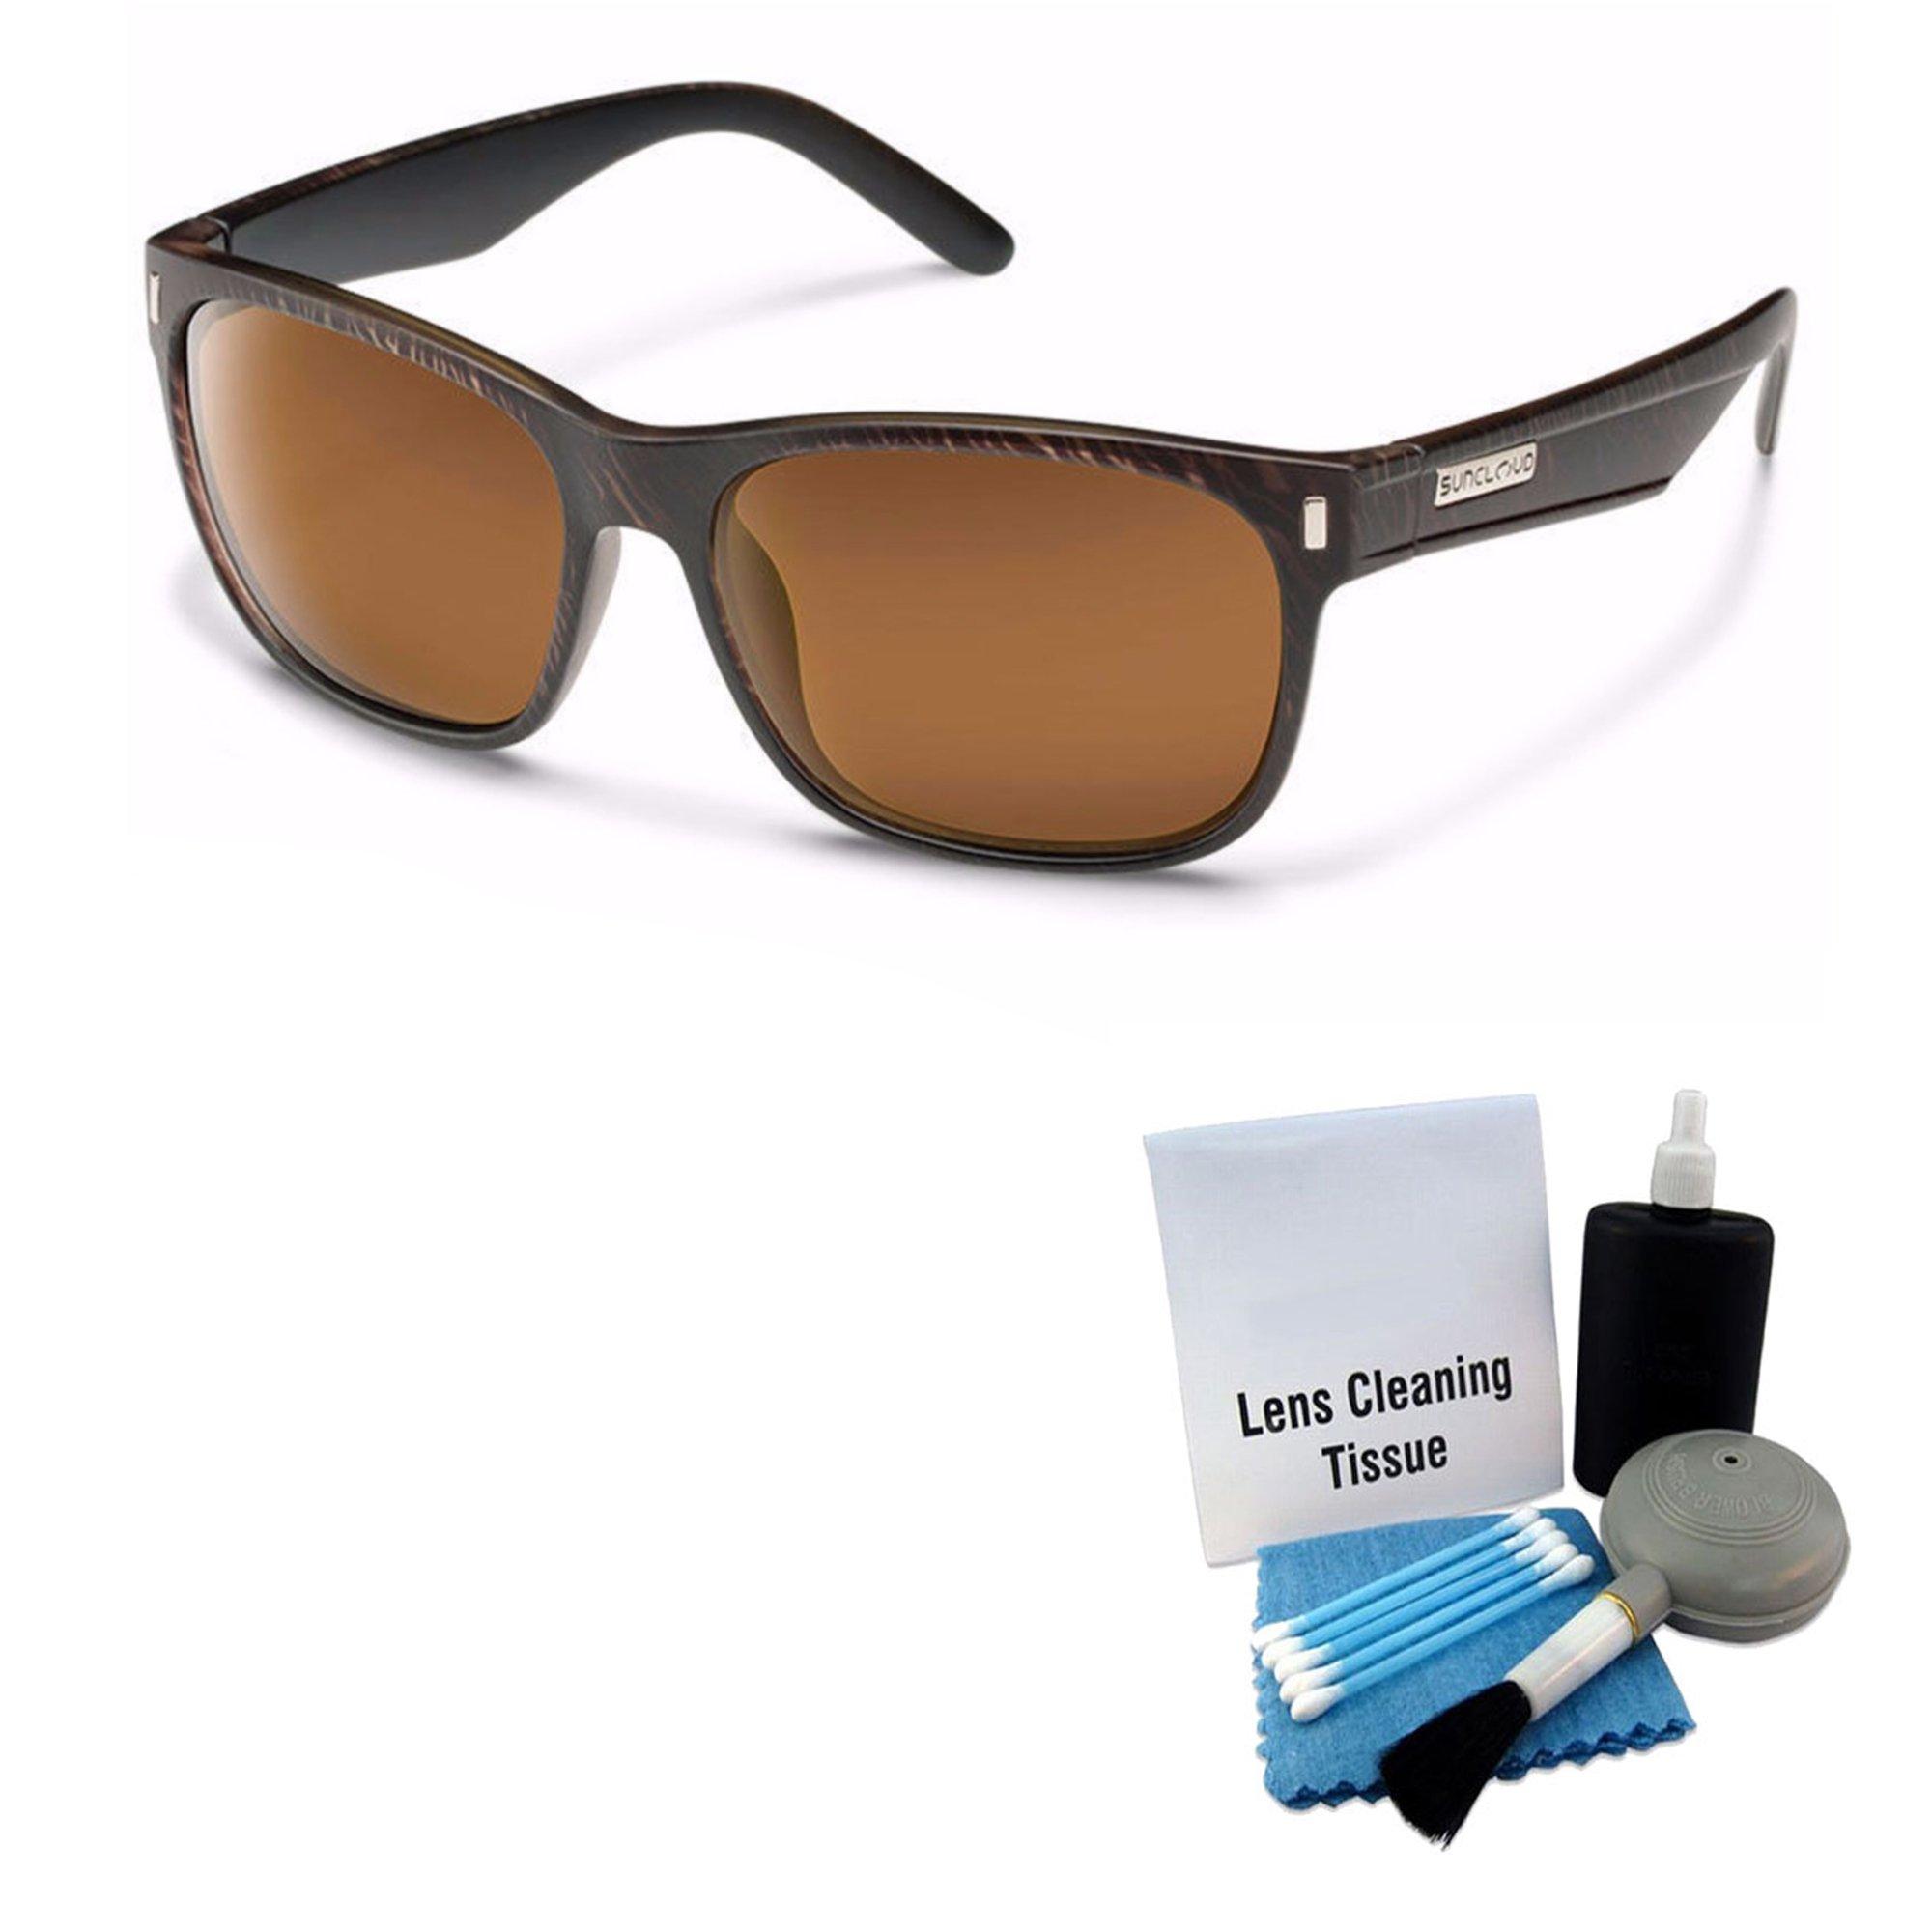 Suncloud Dashboard Injection Sunglasses - Blackened Tortoise Frame, Brown Lens Lens Cleaning Kit